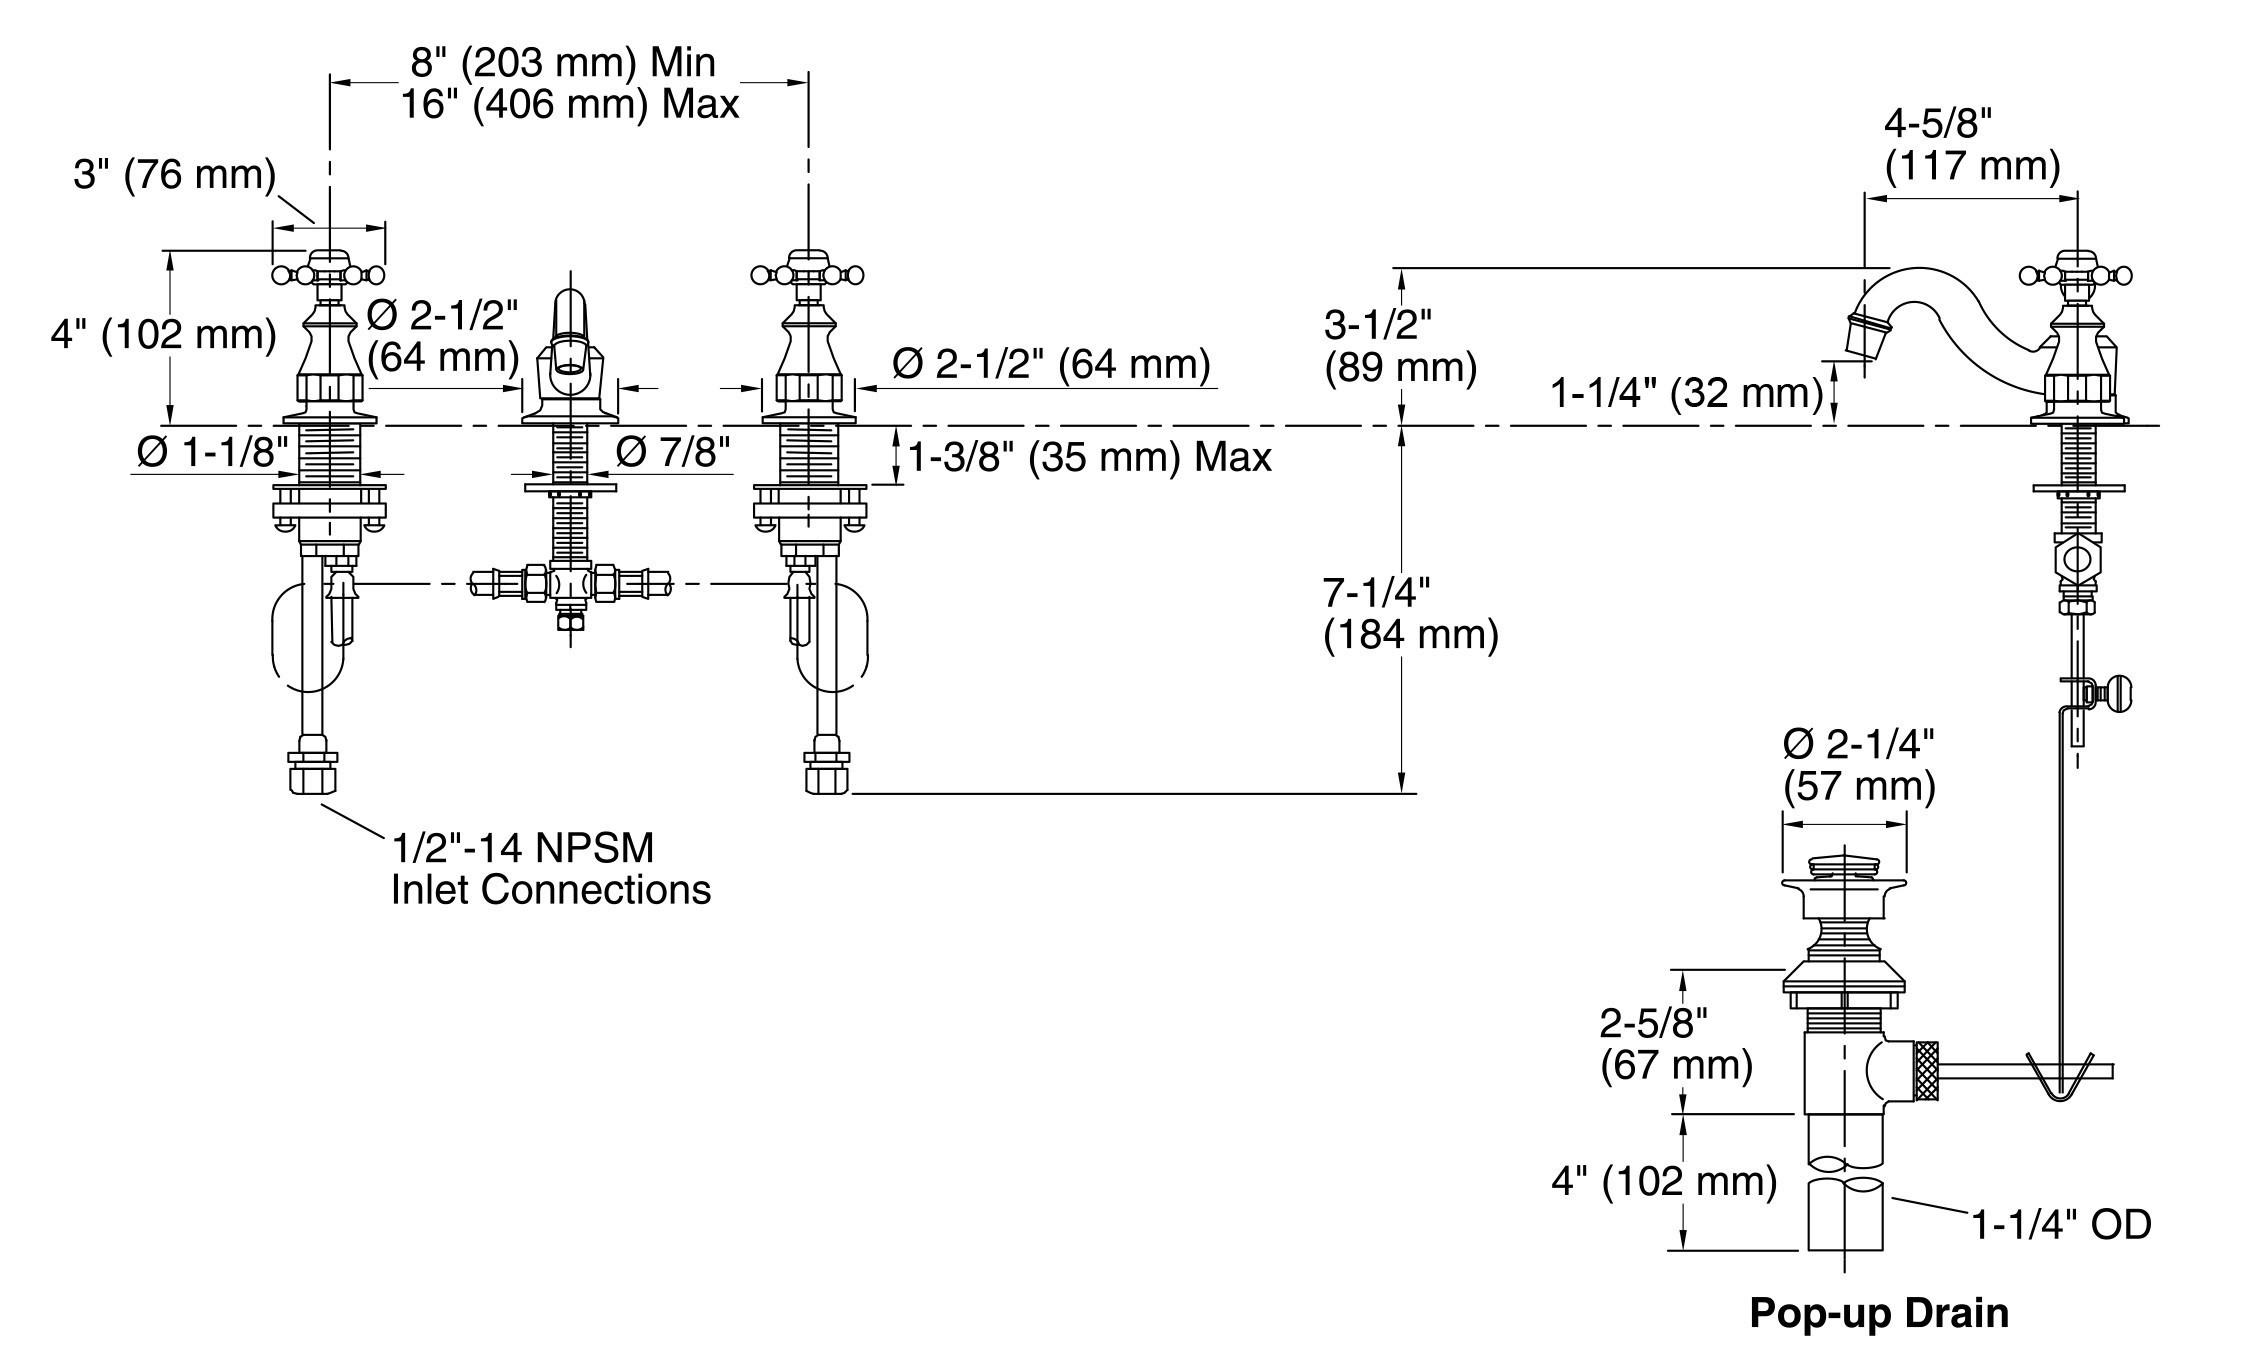 American Standard Shower Faucet Parts Diagram Elegant American Standard Shower Faucet Parts Diagram